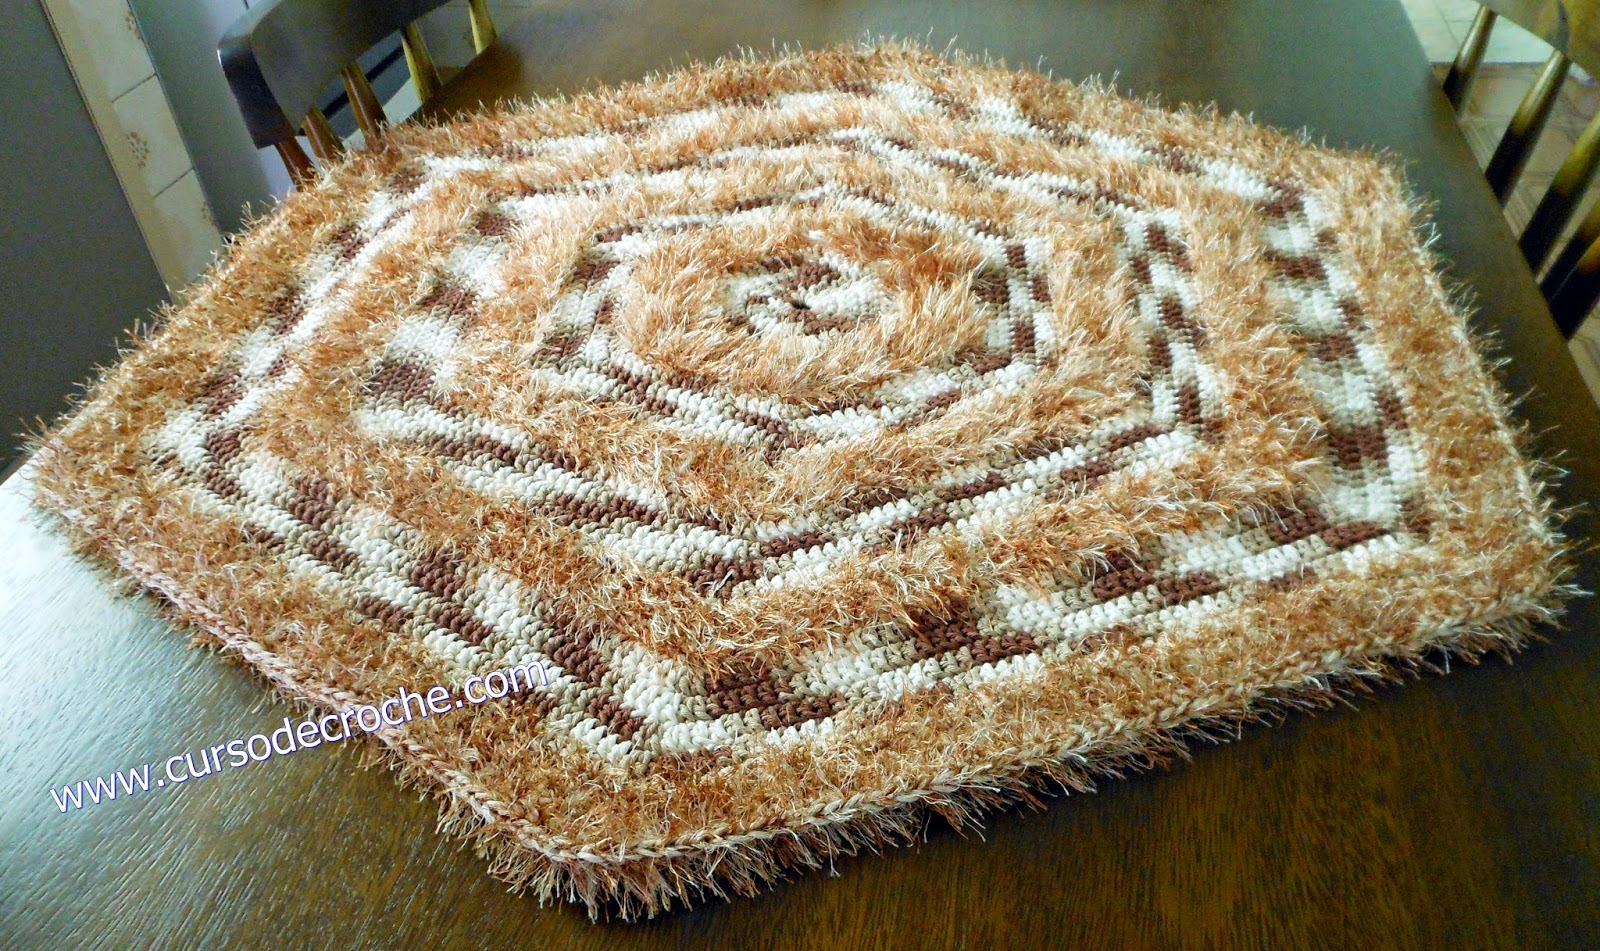 aprender croche tapetes sextavado decore loja curso de croche dvd video-aulas frete gratis edinir-croche